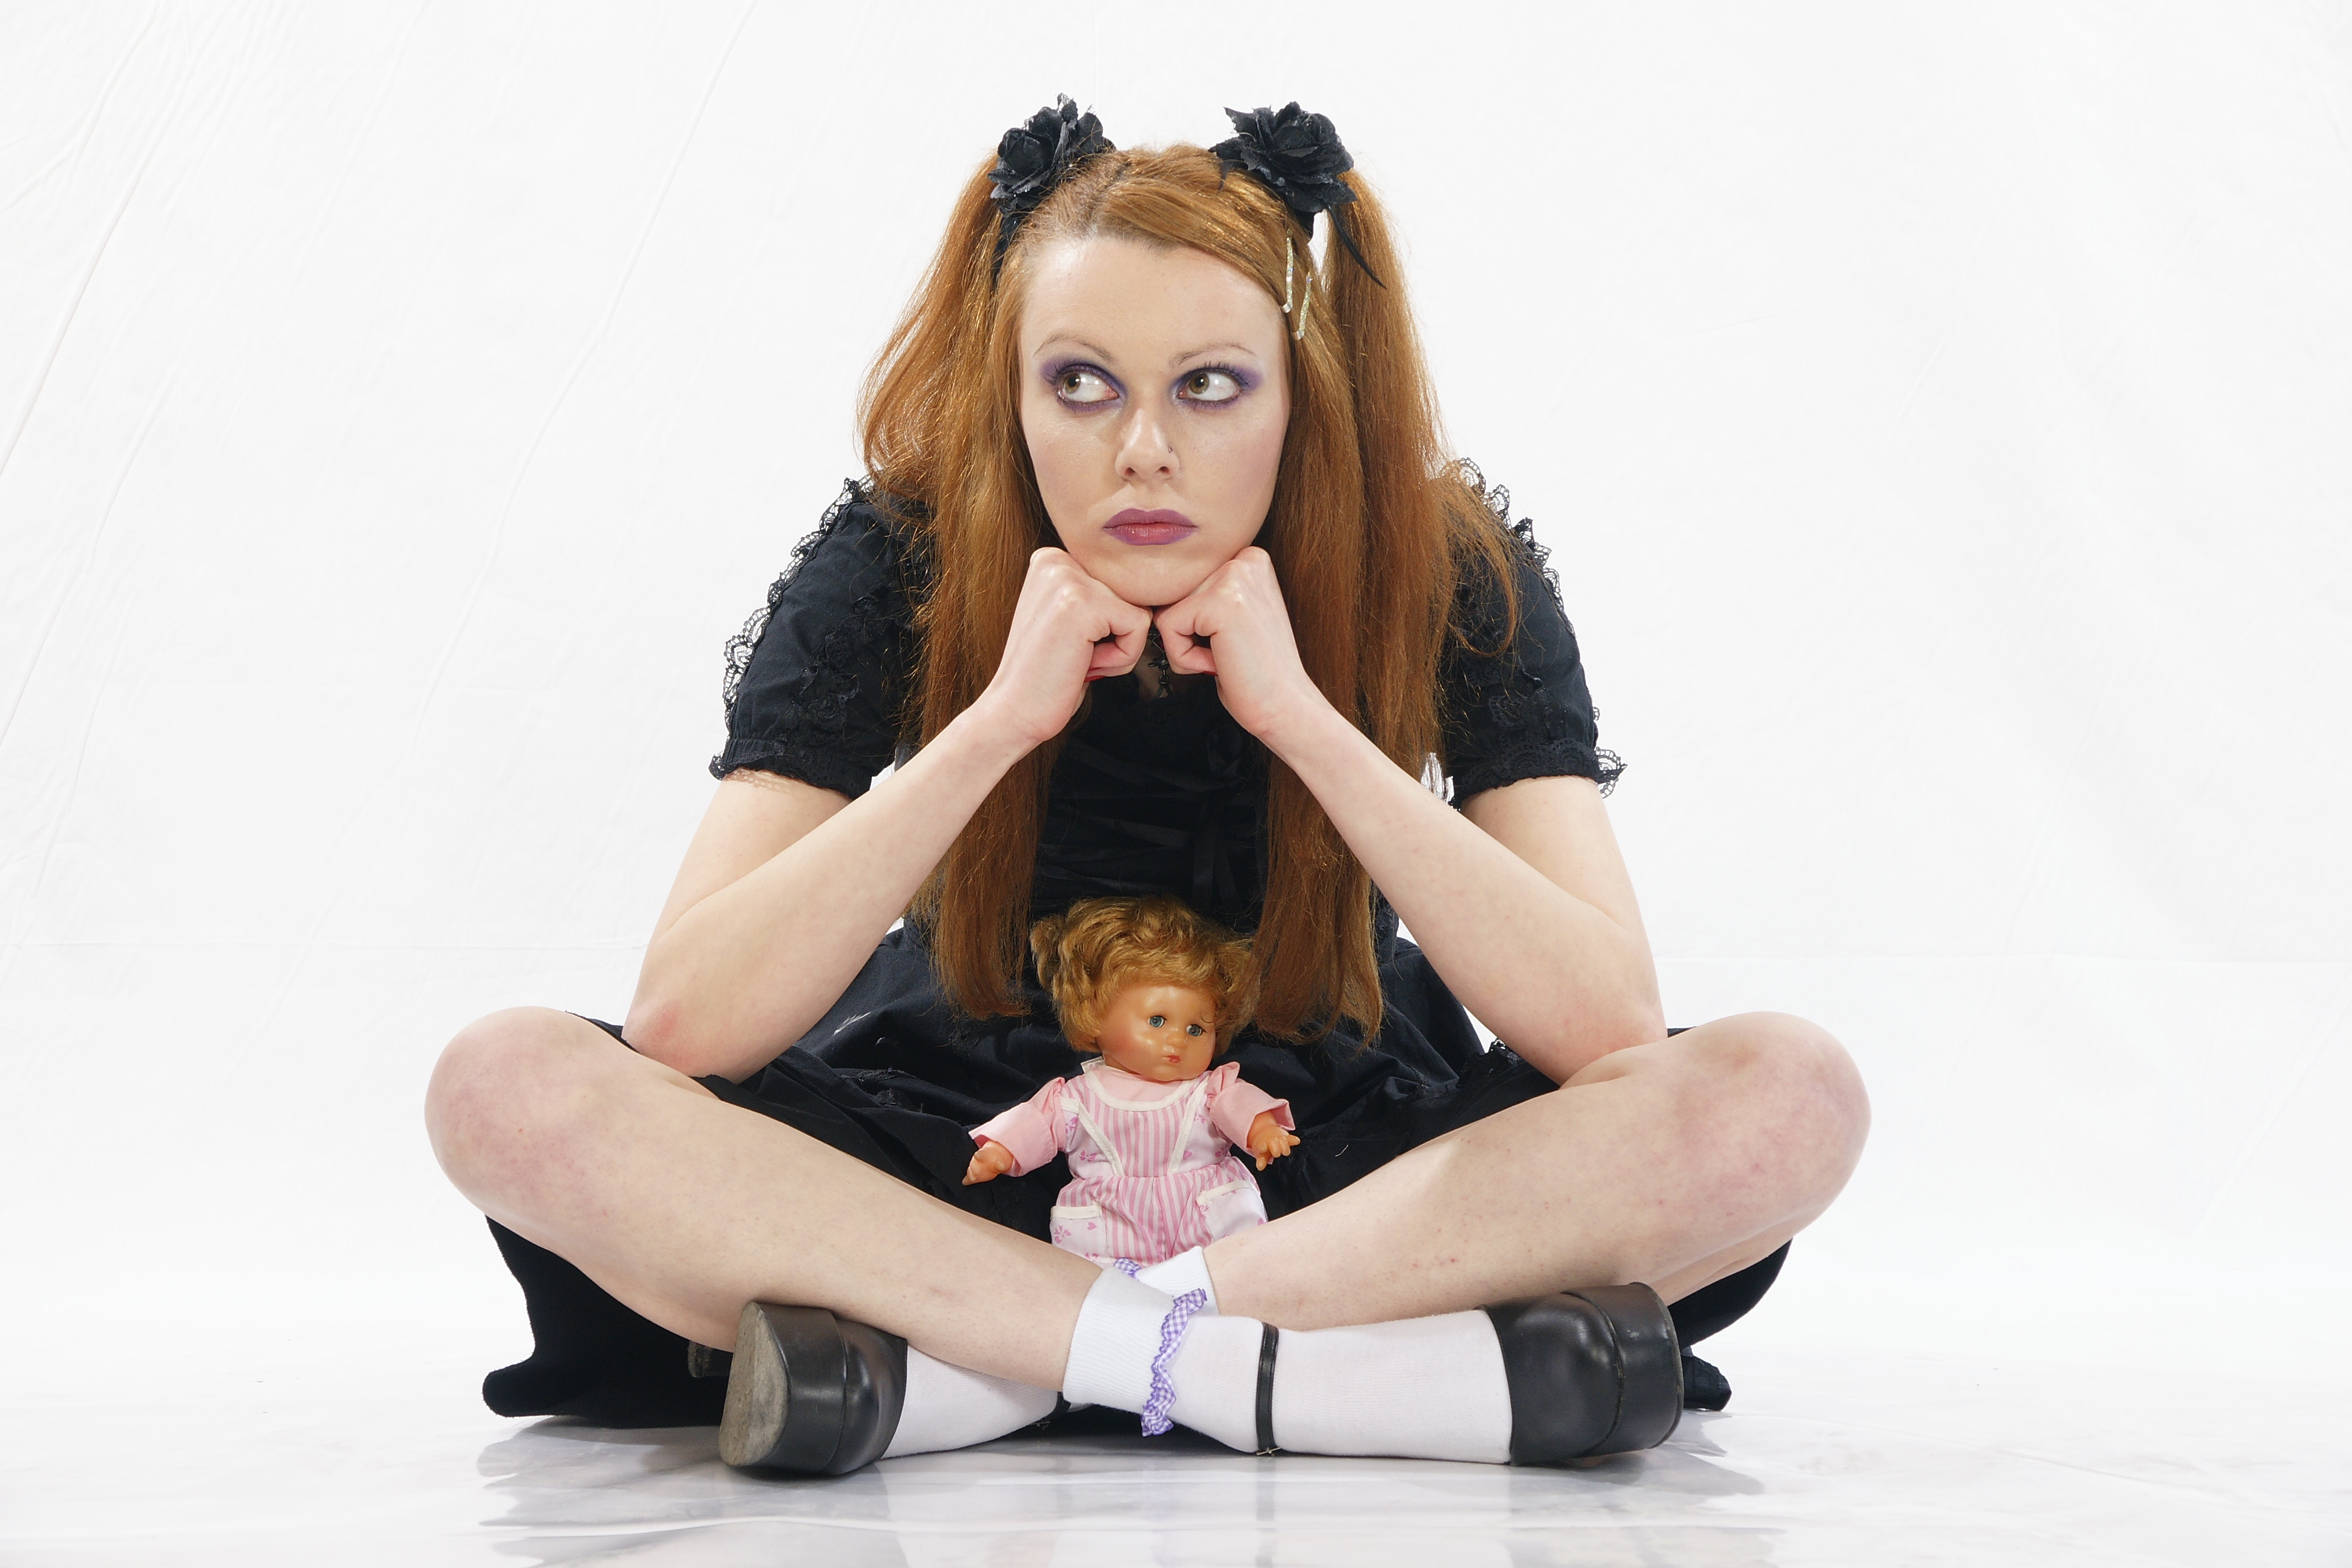 doll by MadaleySelket